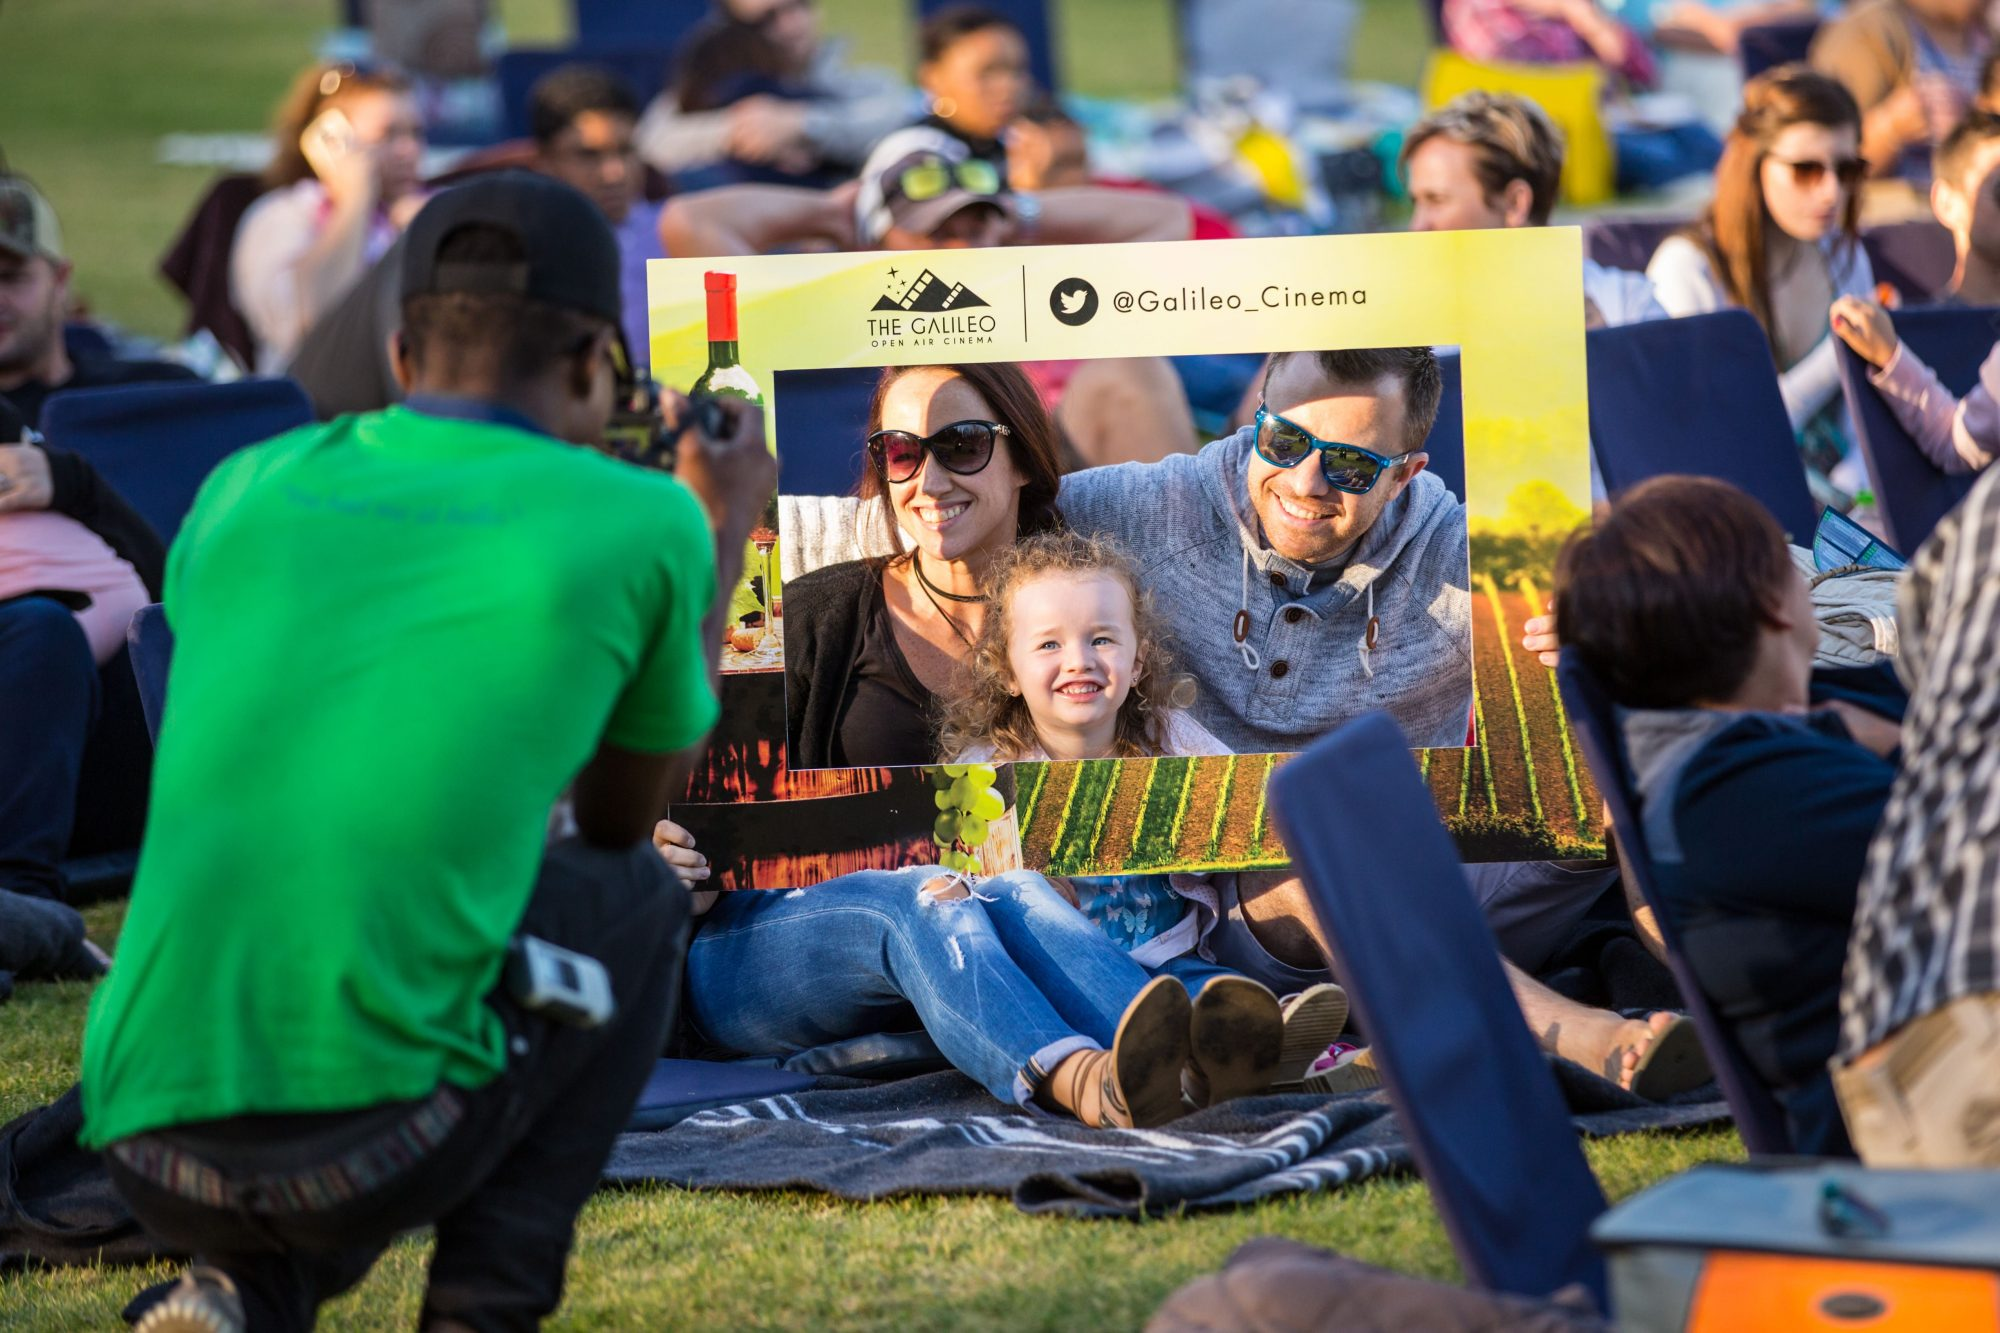 The Galileo Open Air Cinema, Western Cape